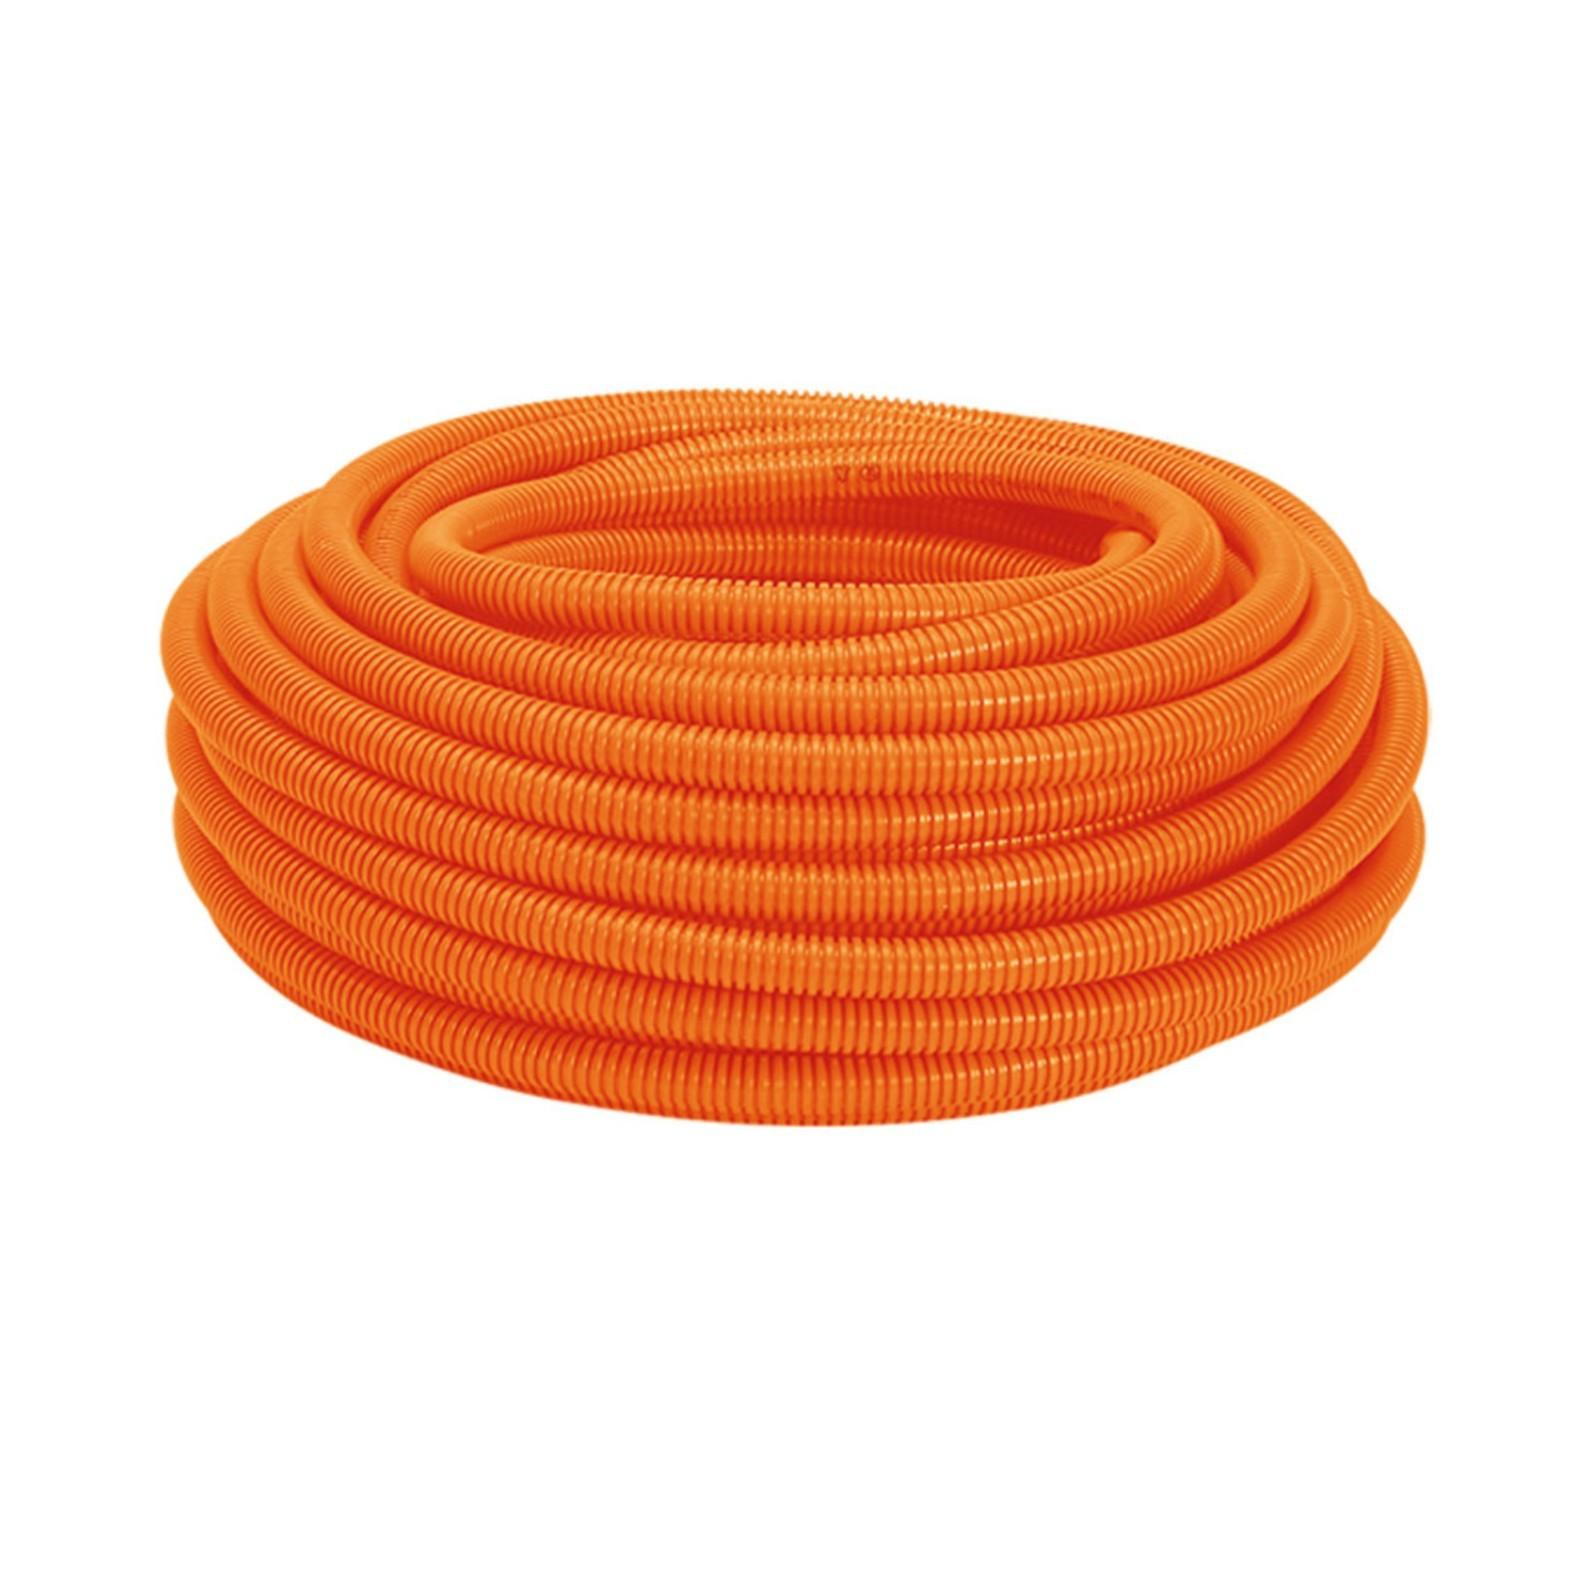 Eletroduto Flexivel Corrugado PVC DN 32 mm x 25m Laranja - Amanco